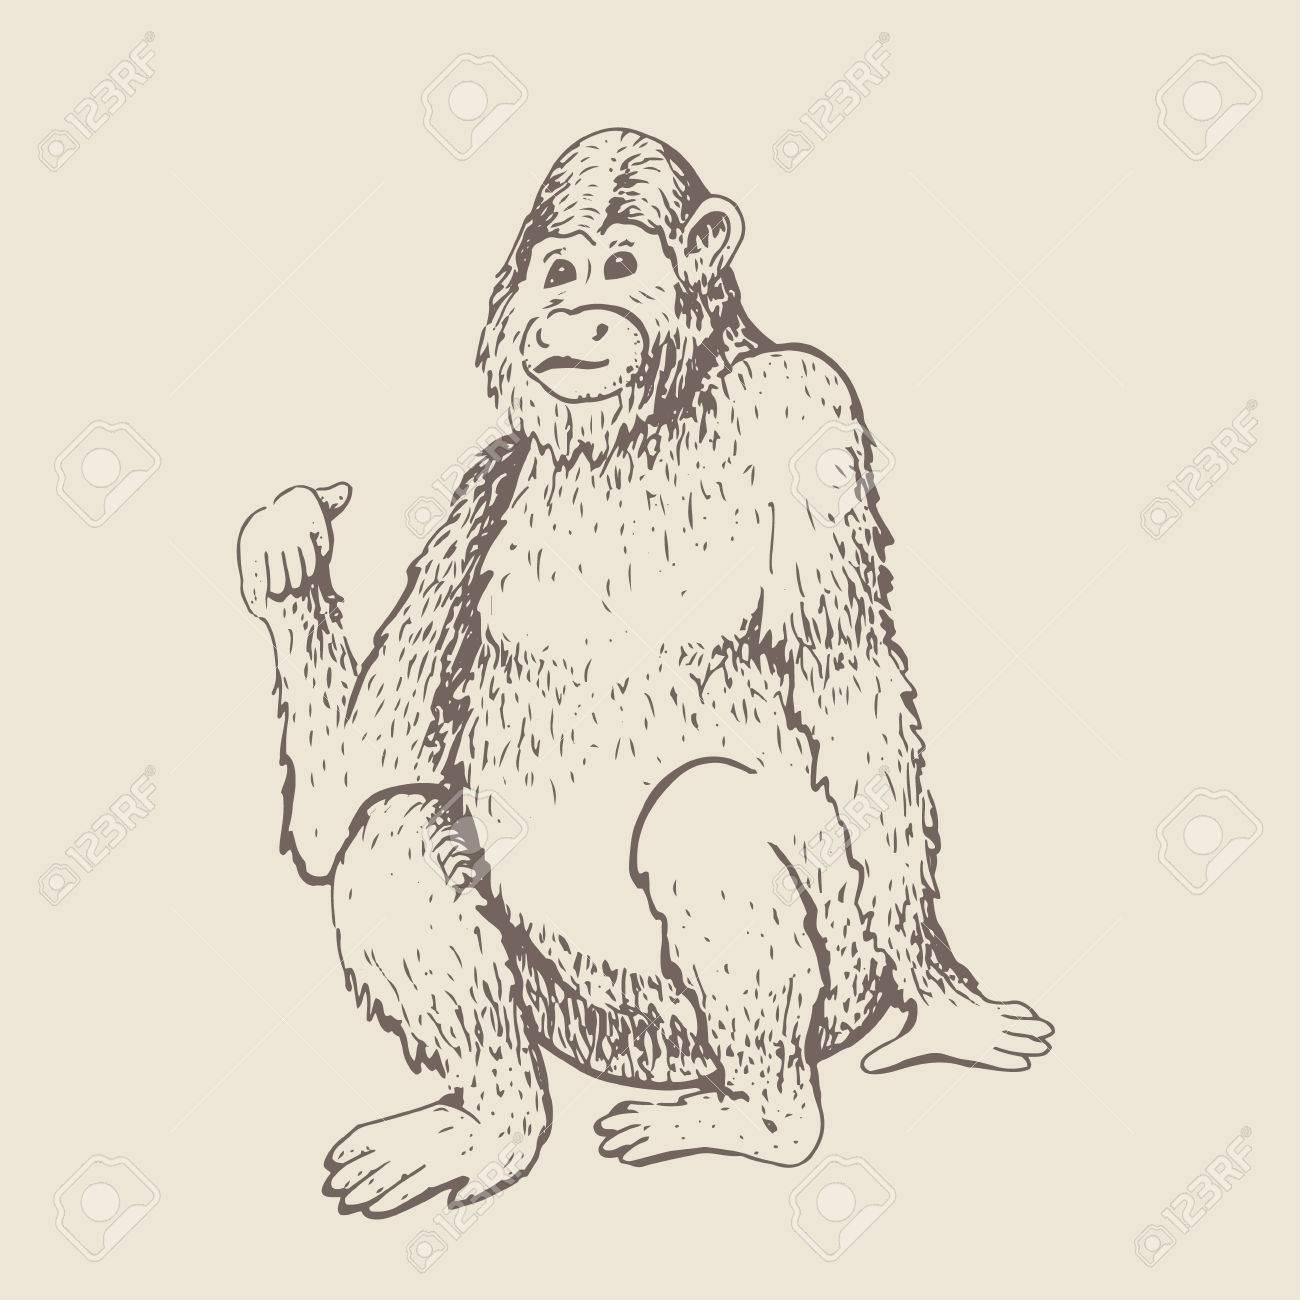 Monkey vector illustration hand drawn sketch of young orangutan smile monkey is sitting